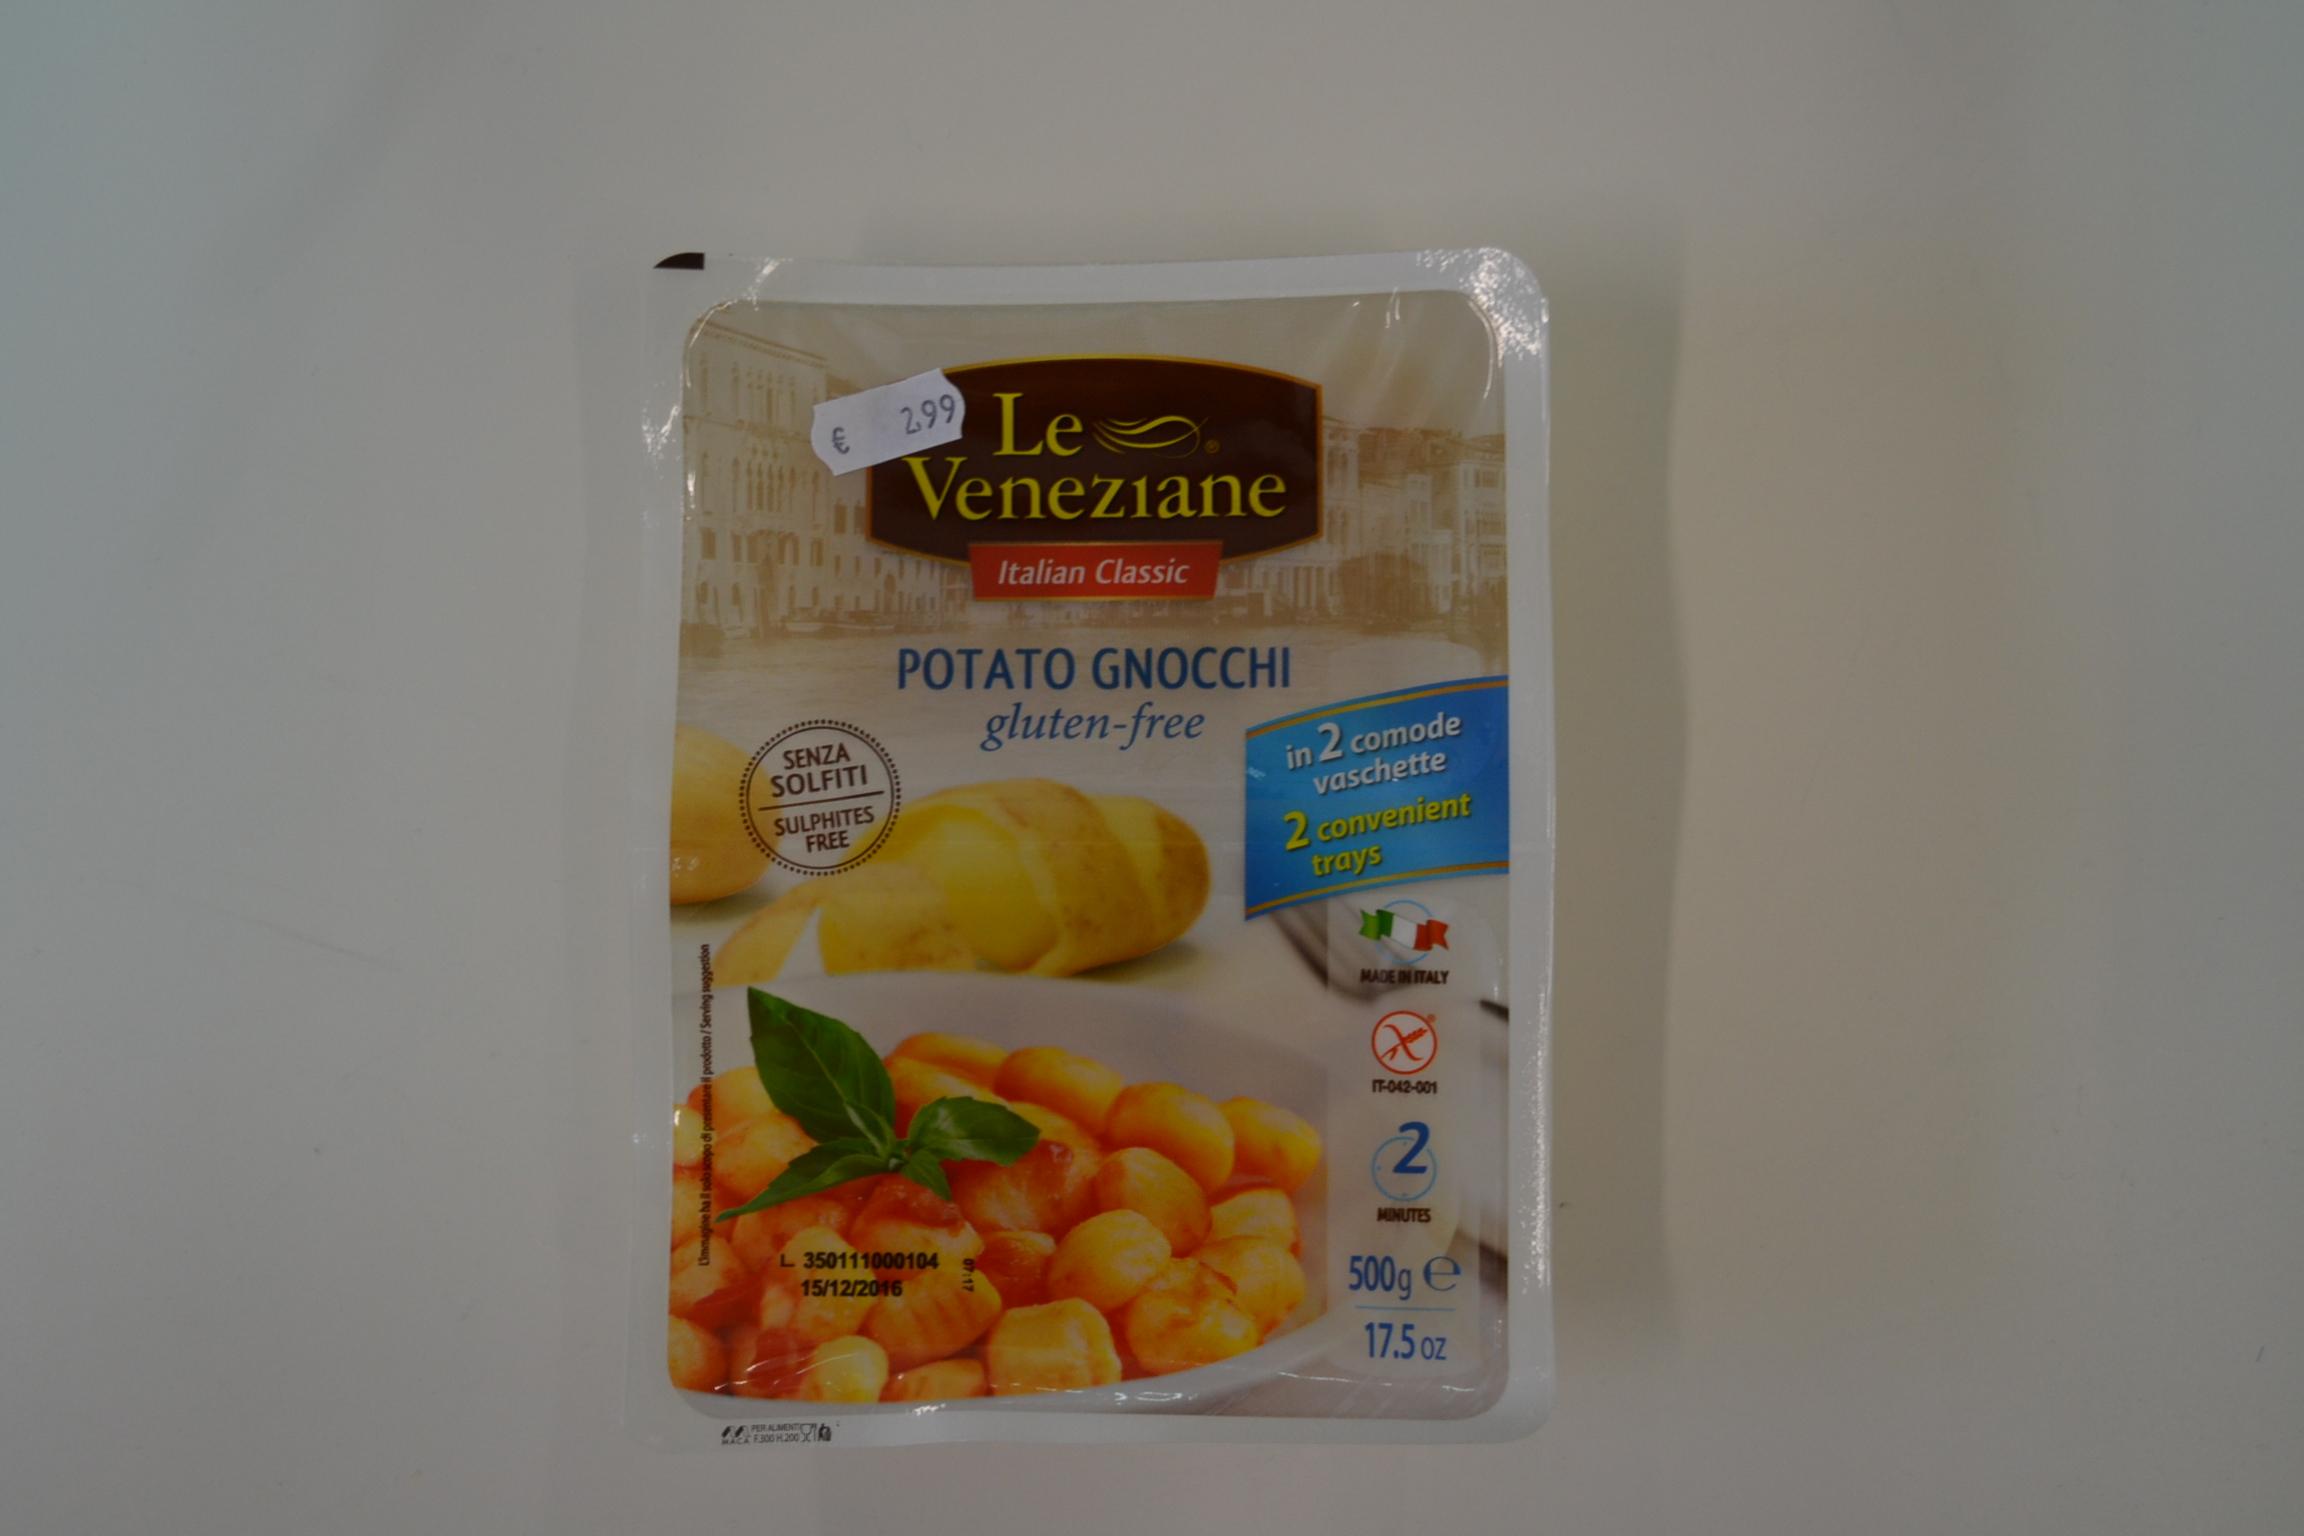 Potato gnocchi LE VENEZIANE € 2,99